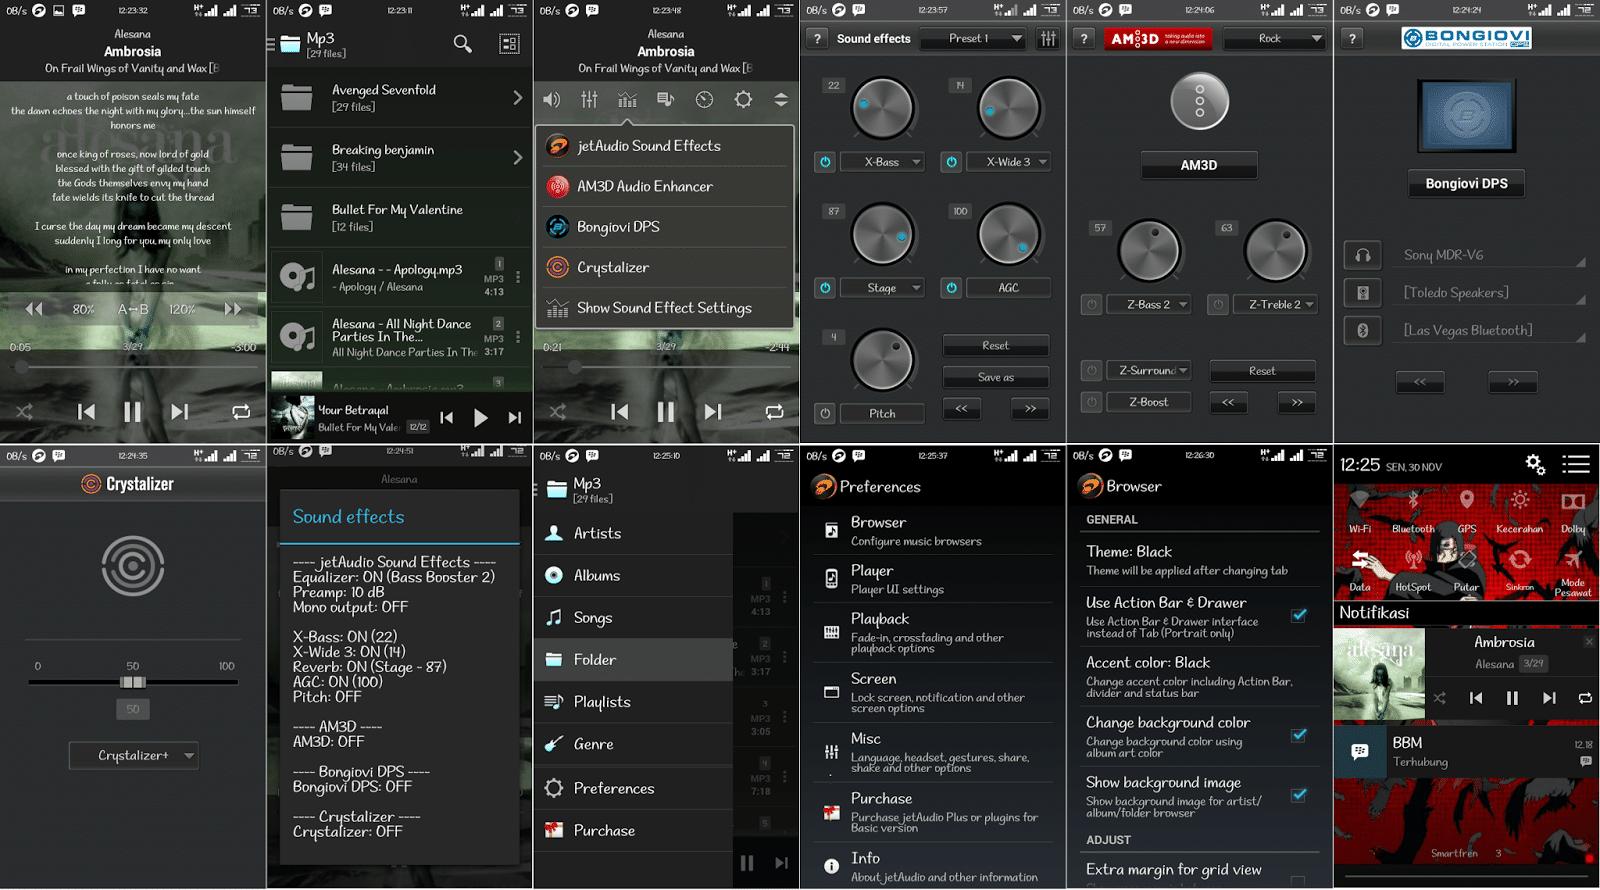 Download-jetAudio-Music-Player